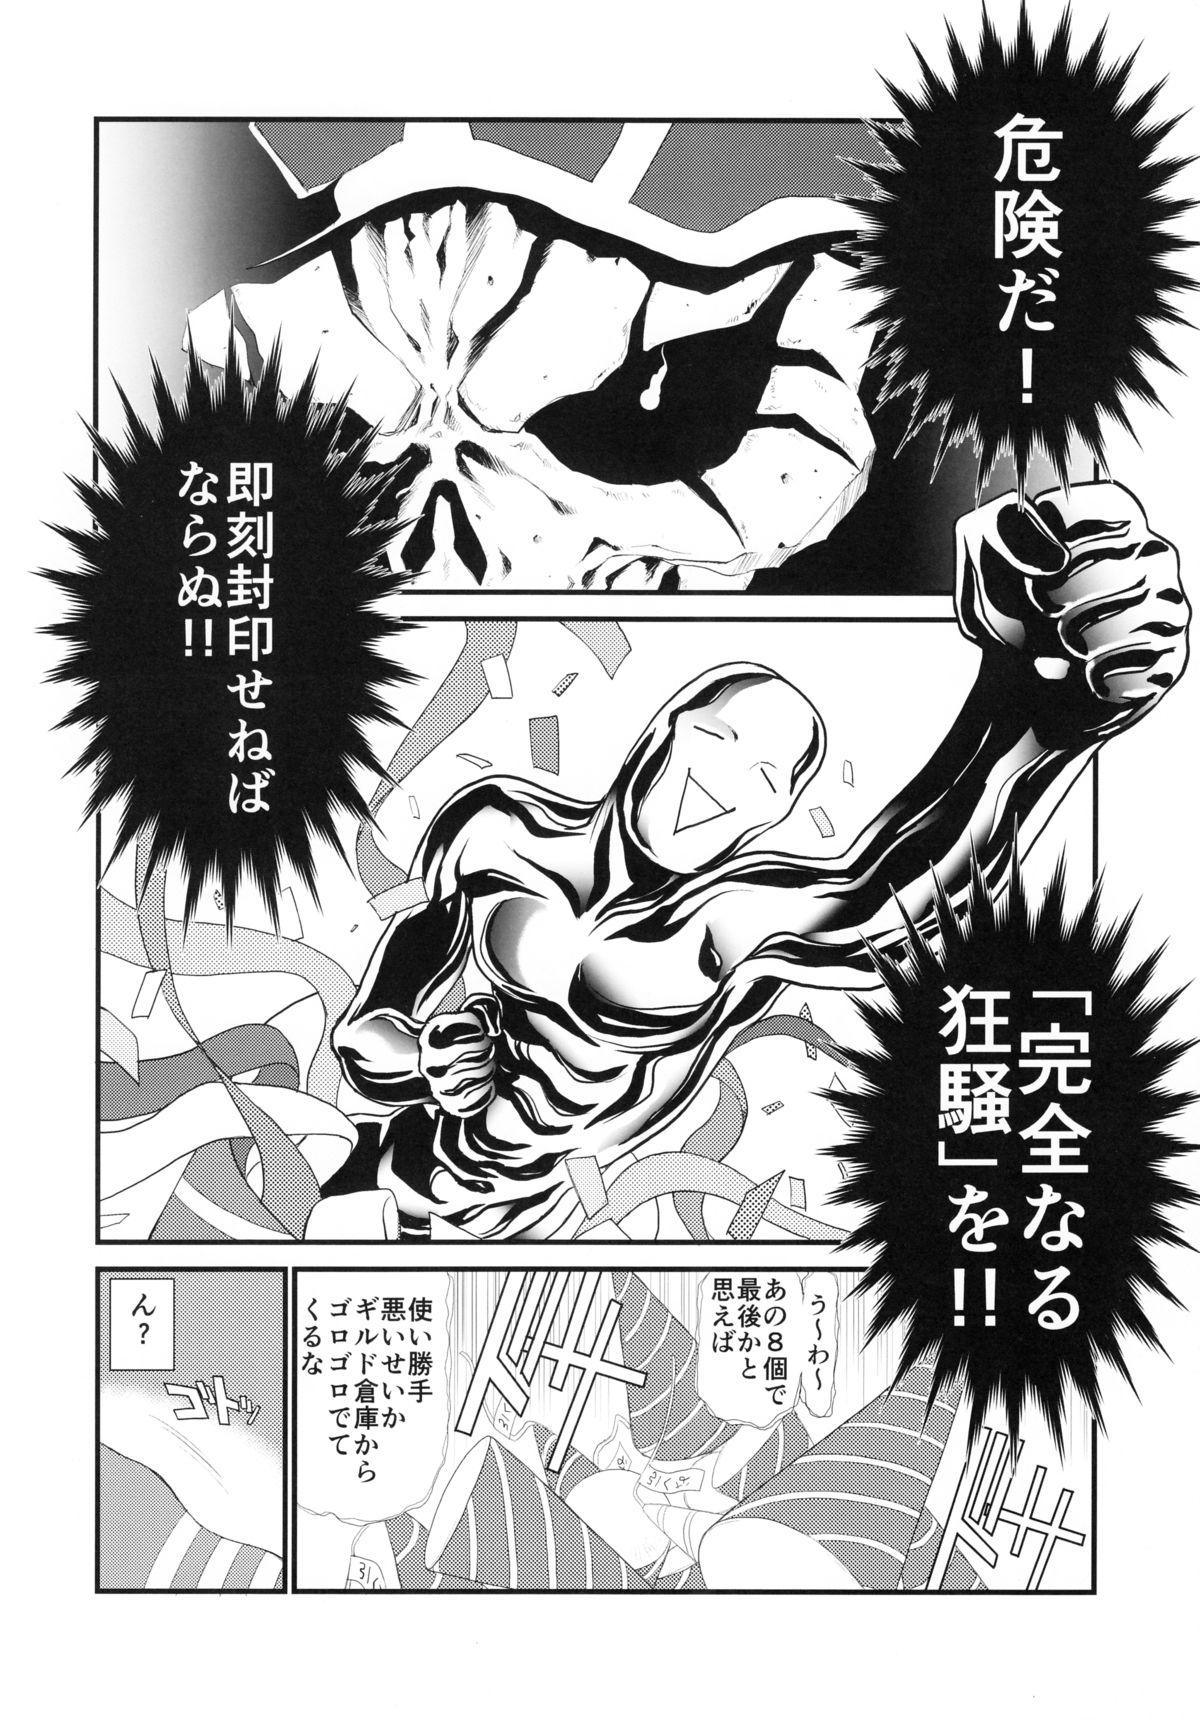 [UROBOROS (Utatane Hiroyuki)] Aru Aru Albedo-sama β-ban (Overlord) 1